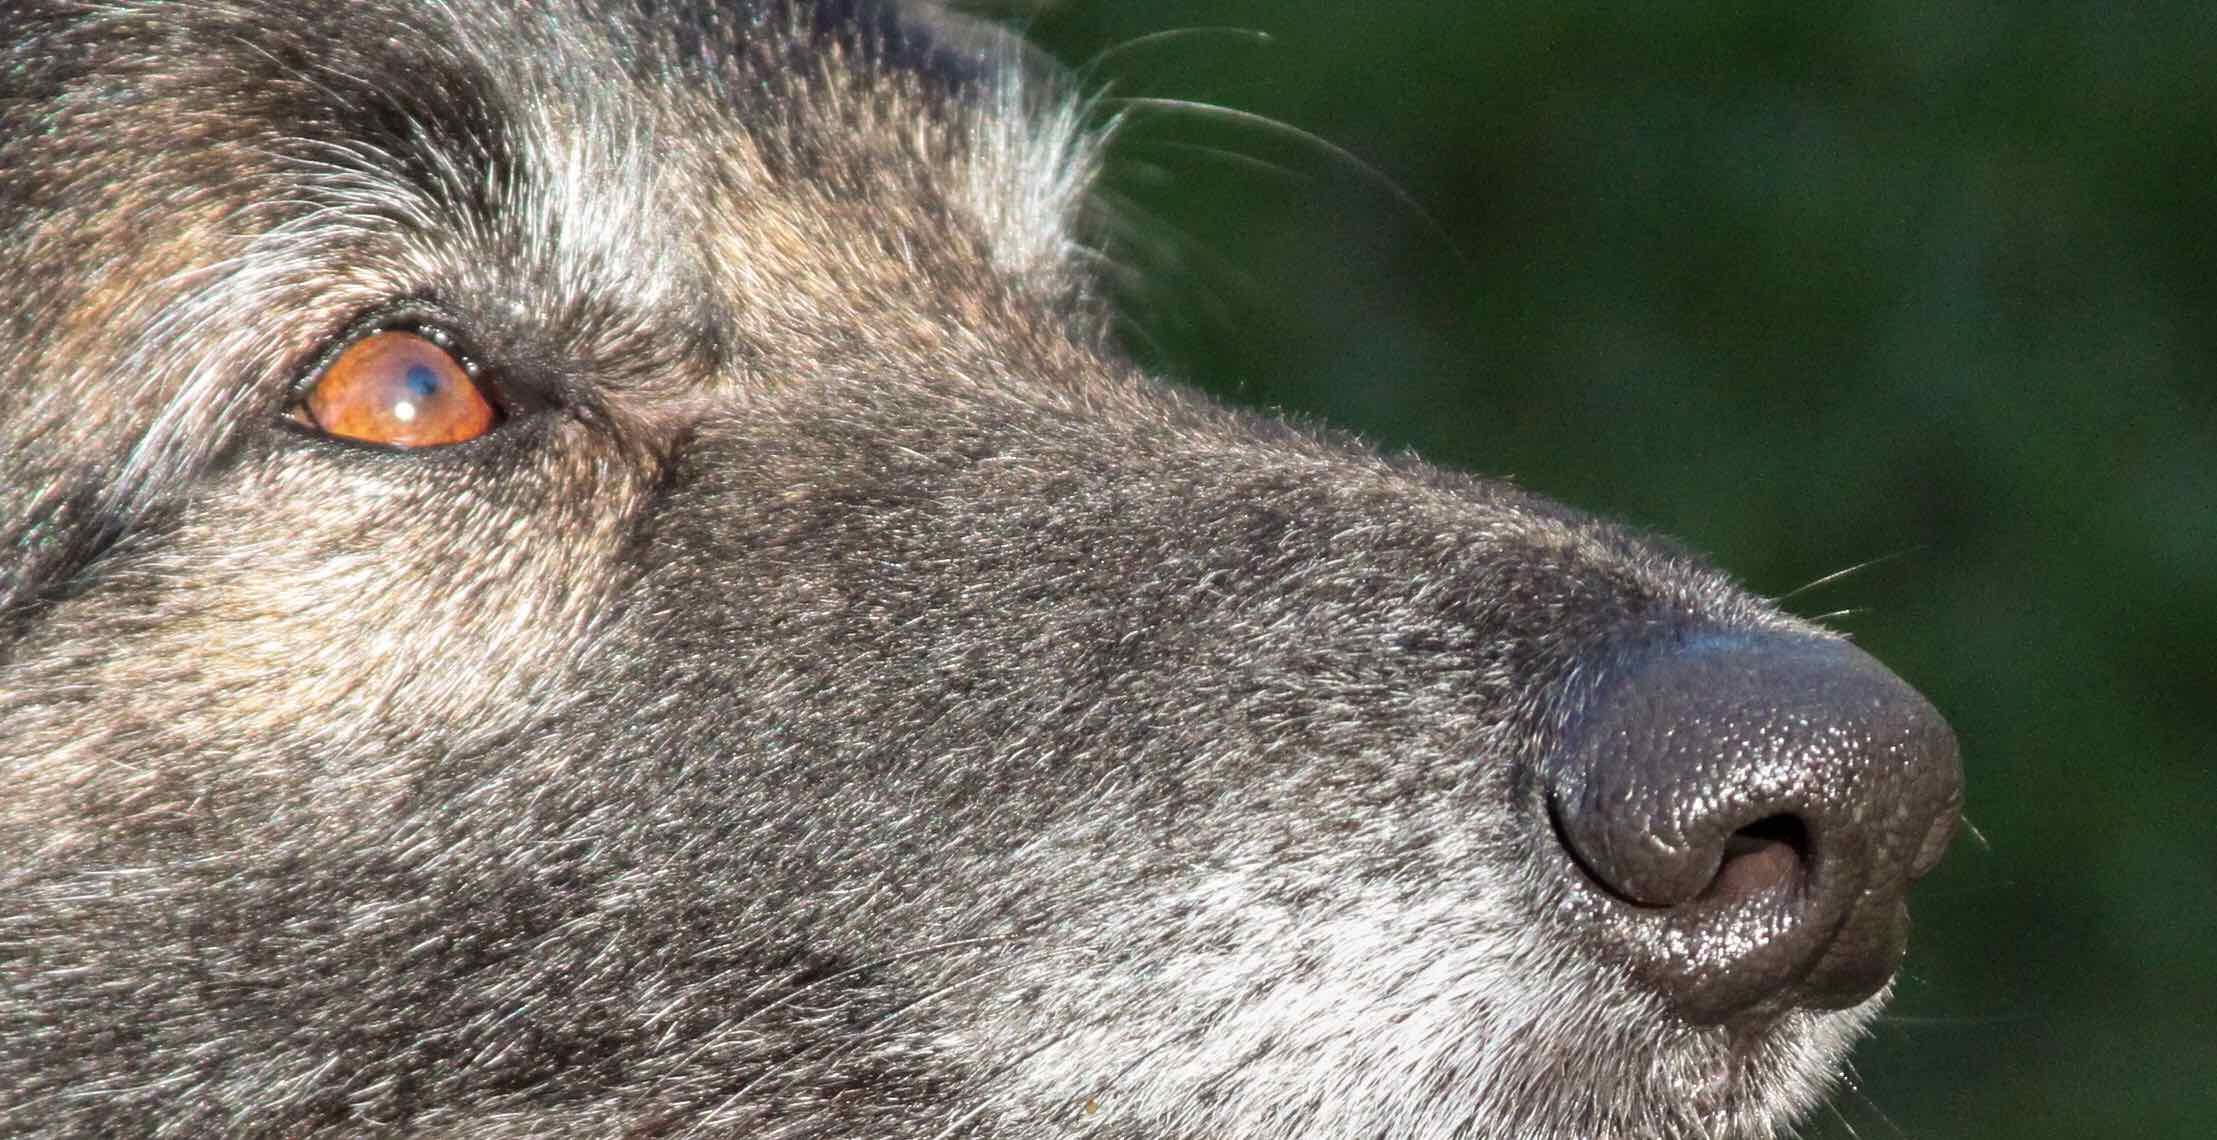 Detection Dog Nose